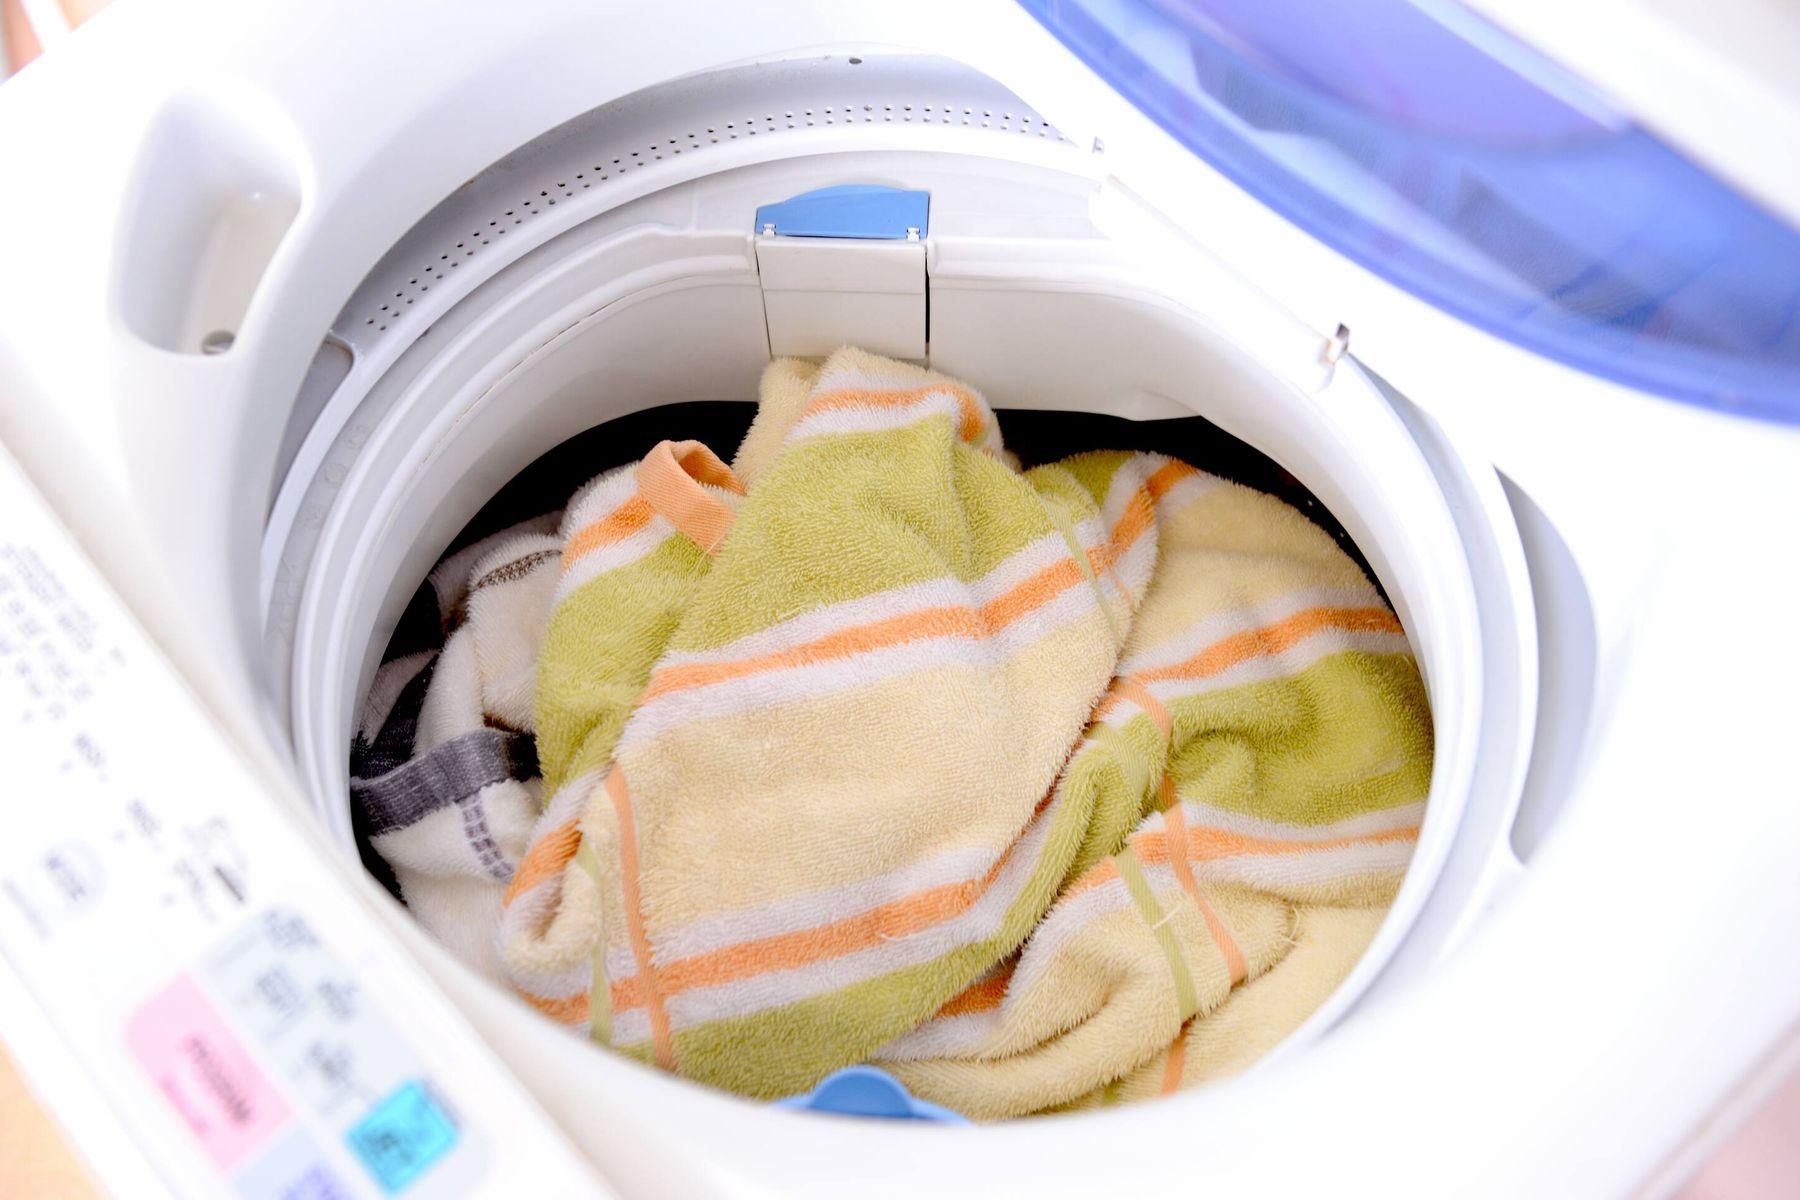 Baju kotor dalam mesin cuci satu tabung